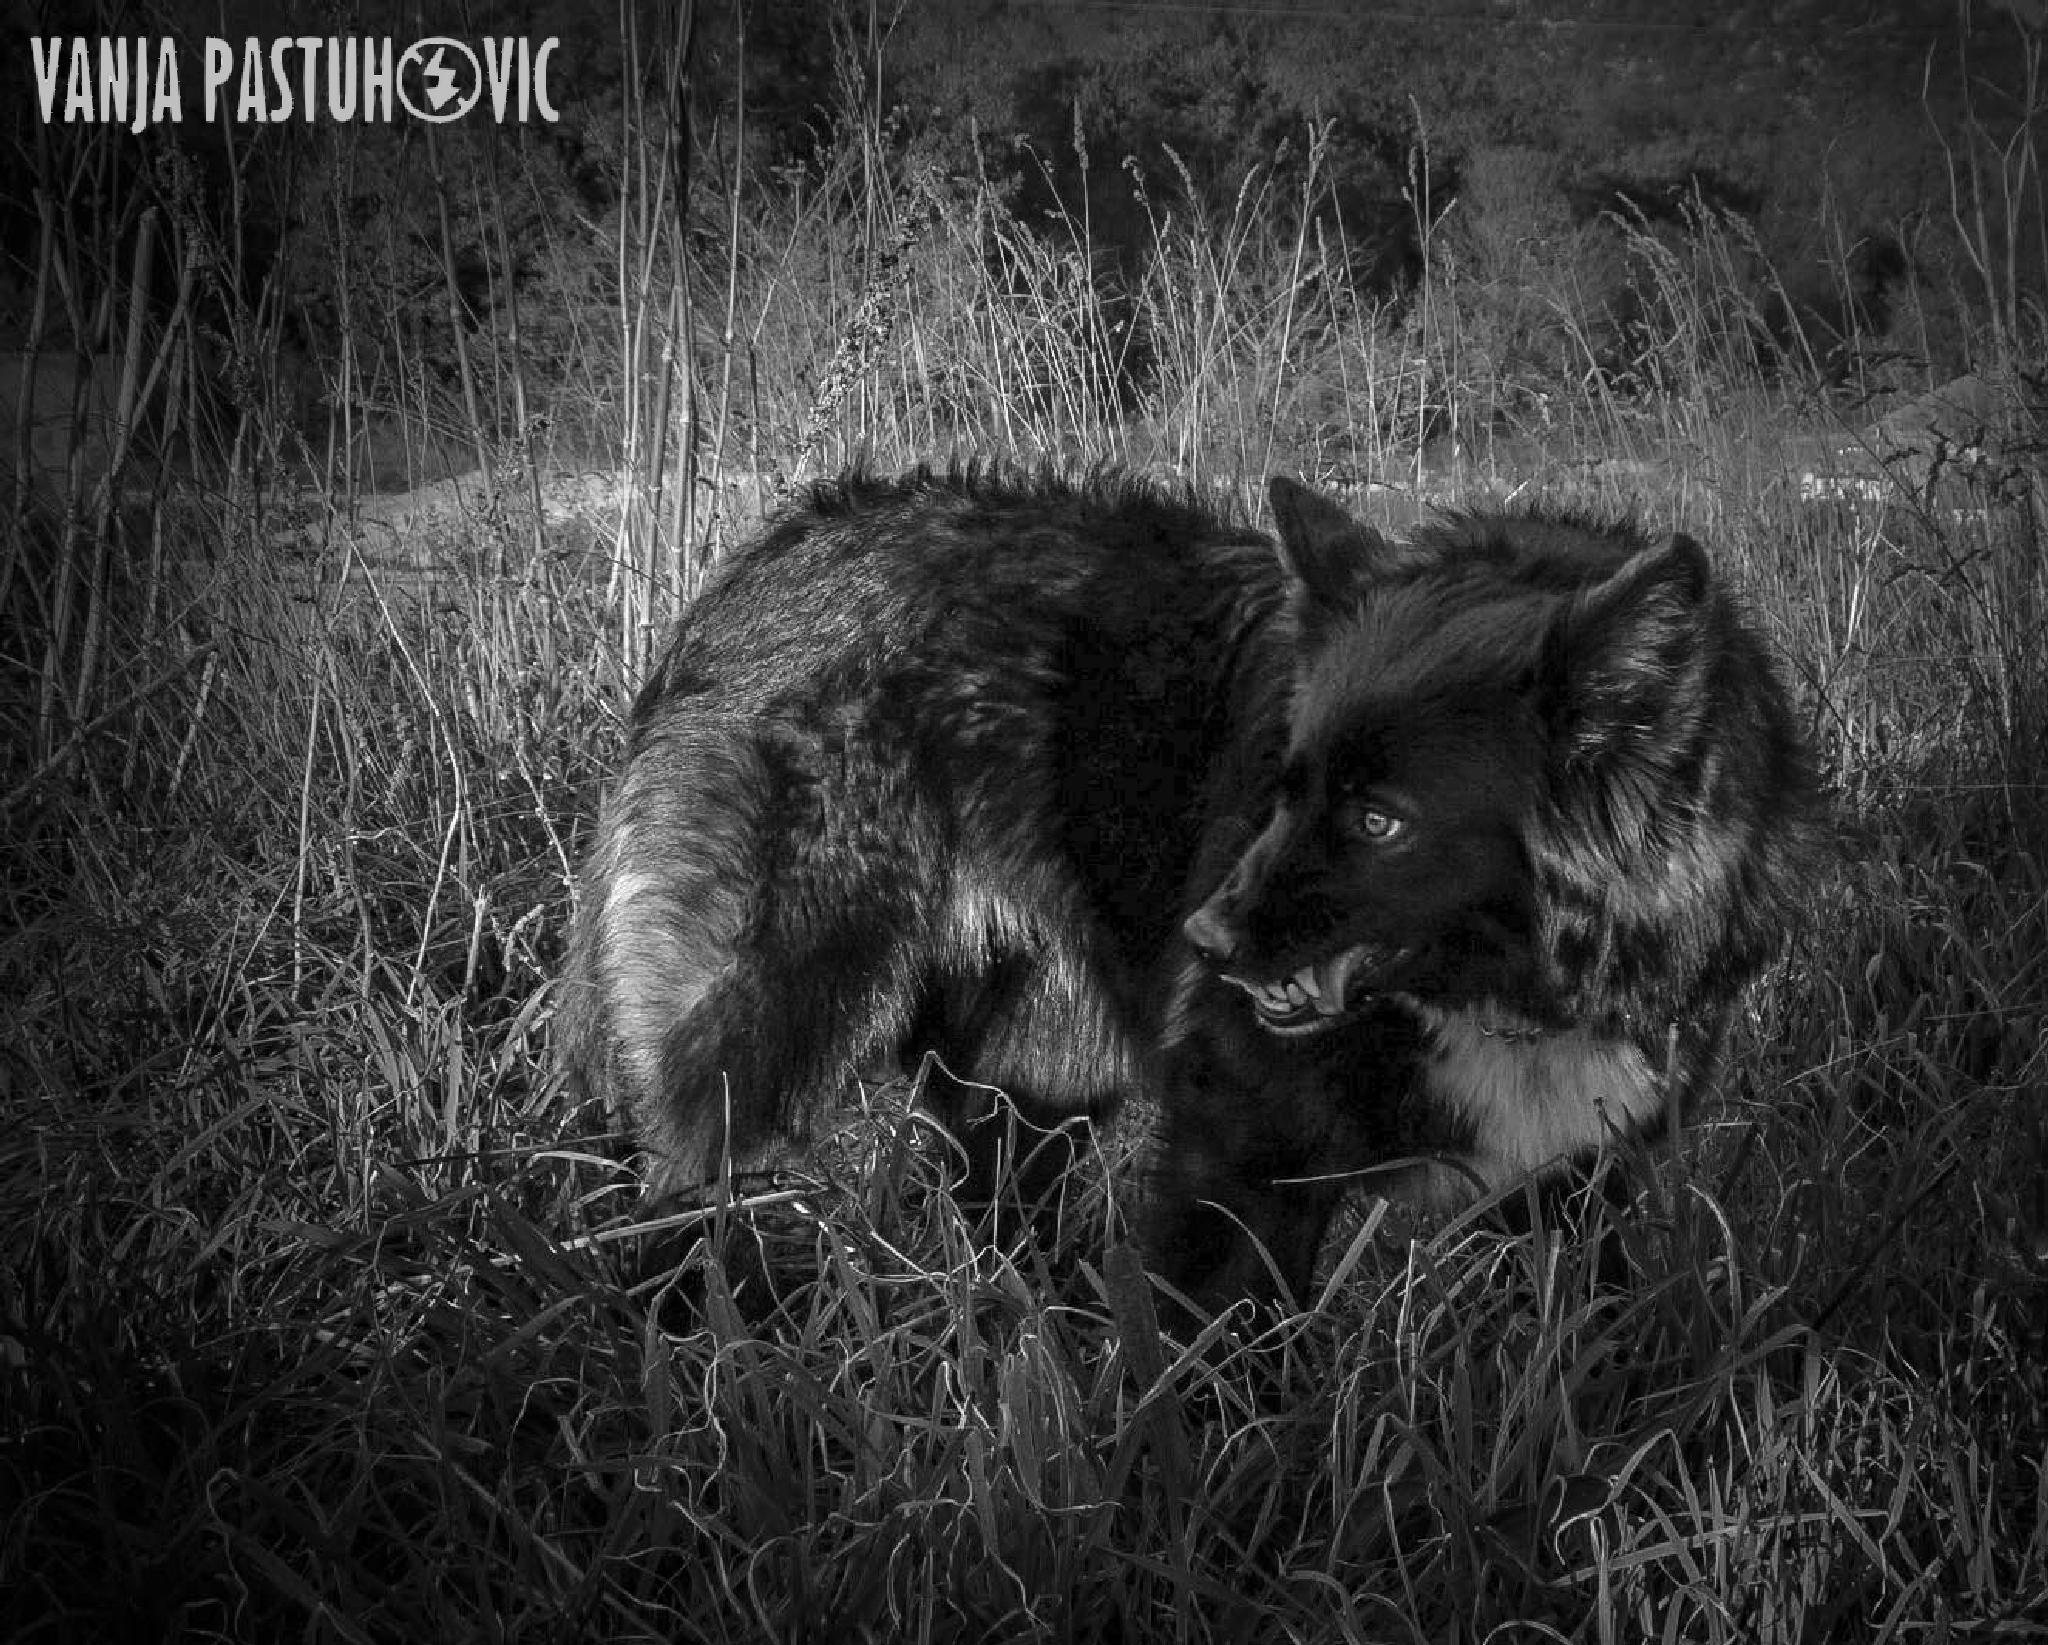 Instinct ..... by Vanja Pastuhovic